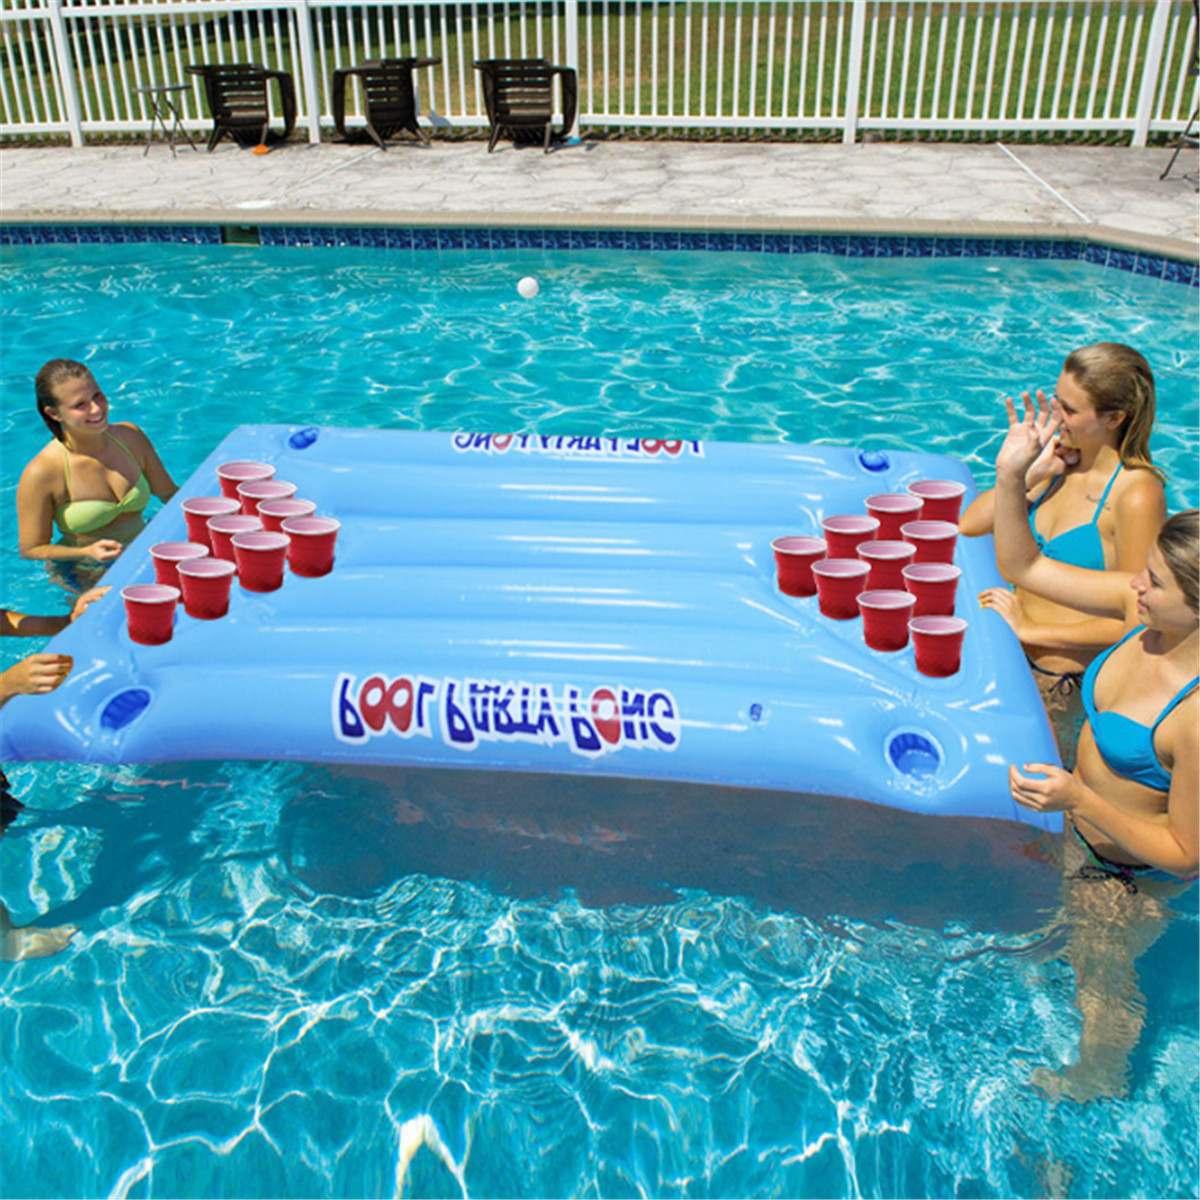 Floating Pool Party Game Raft Lounge Beer Pong , Jeu gonflable flottant Gonflable Pool Party Barge Floating Beer Pong Float Cooler Blue 5 Feet